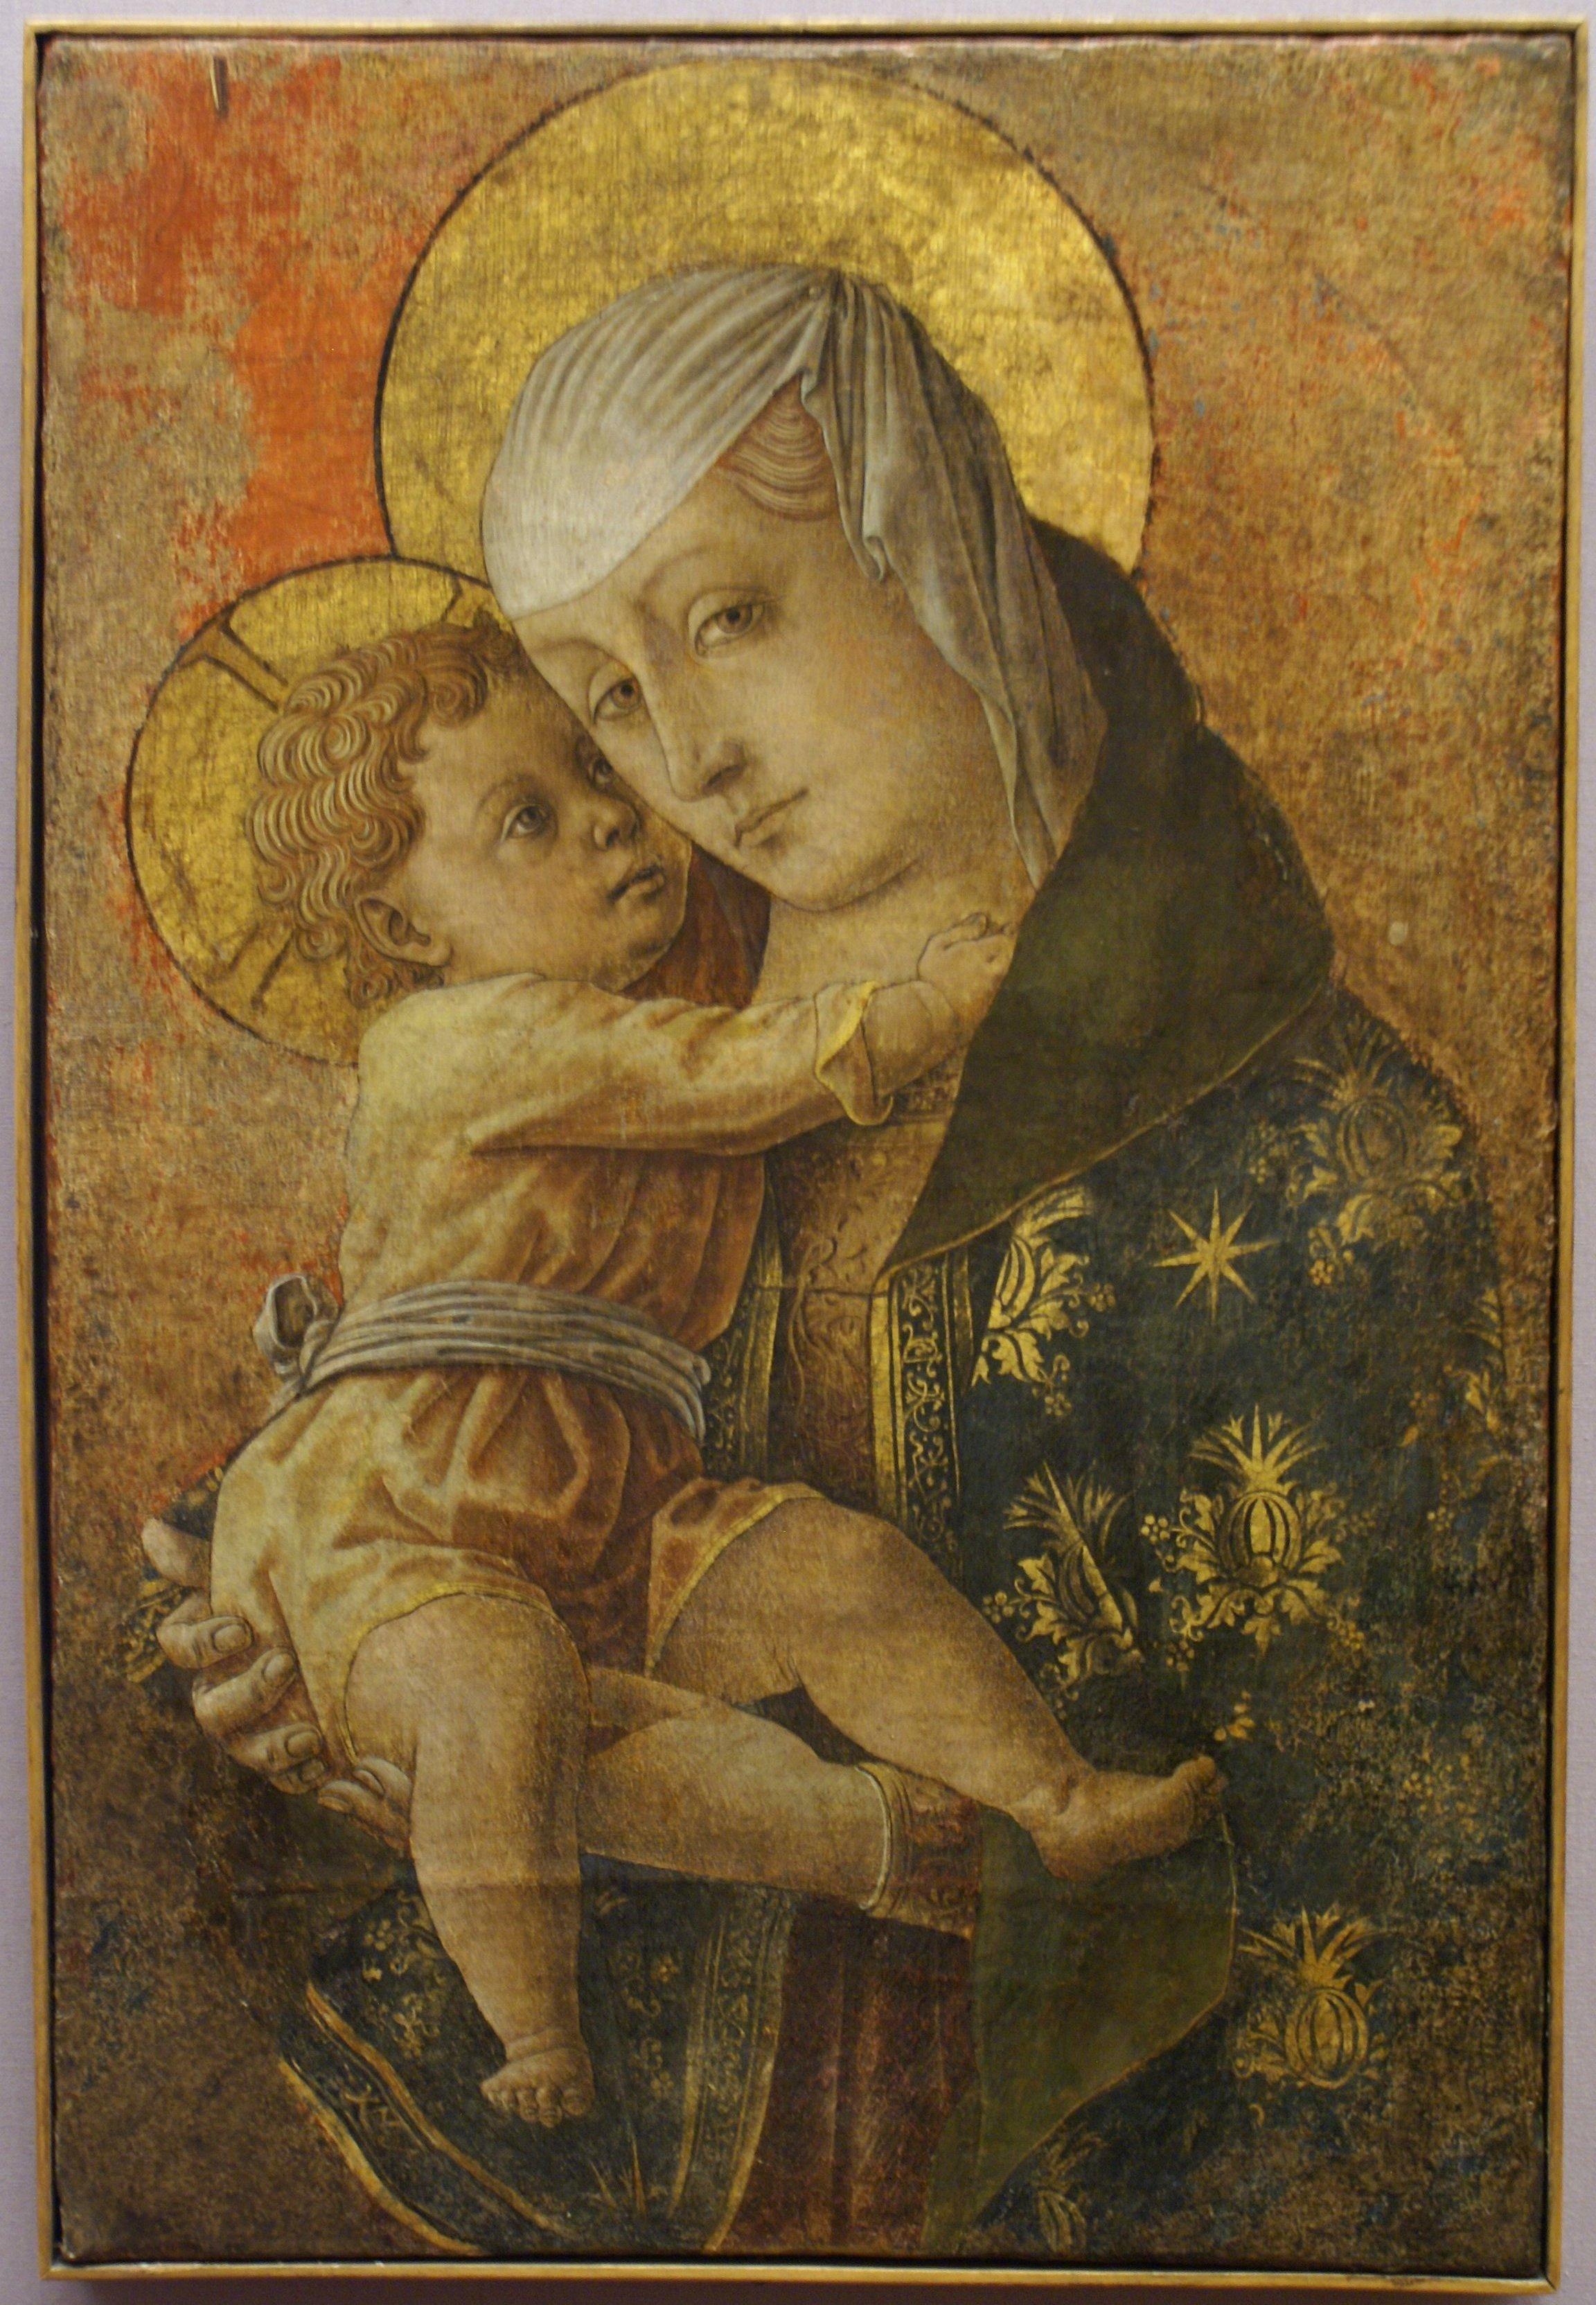 Carlo_Crivelli_-_Madonna_con_Bambino.jpg